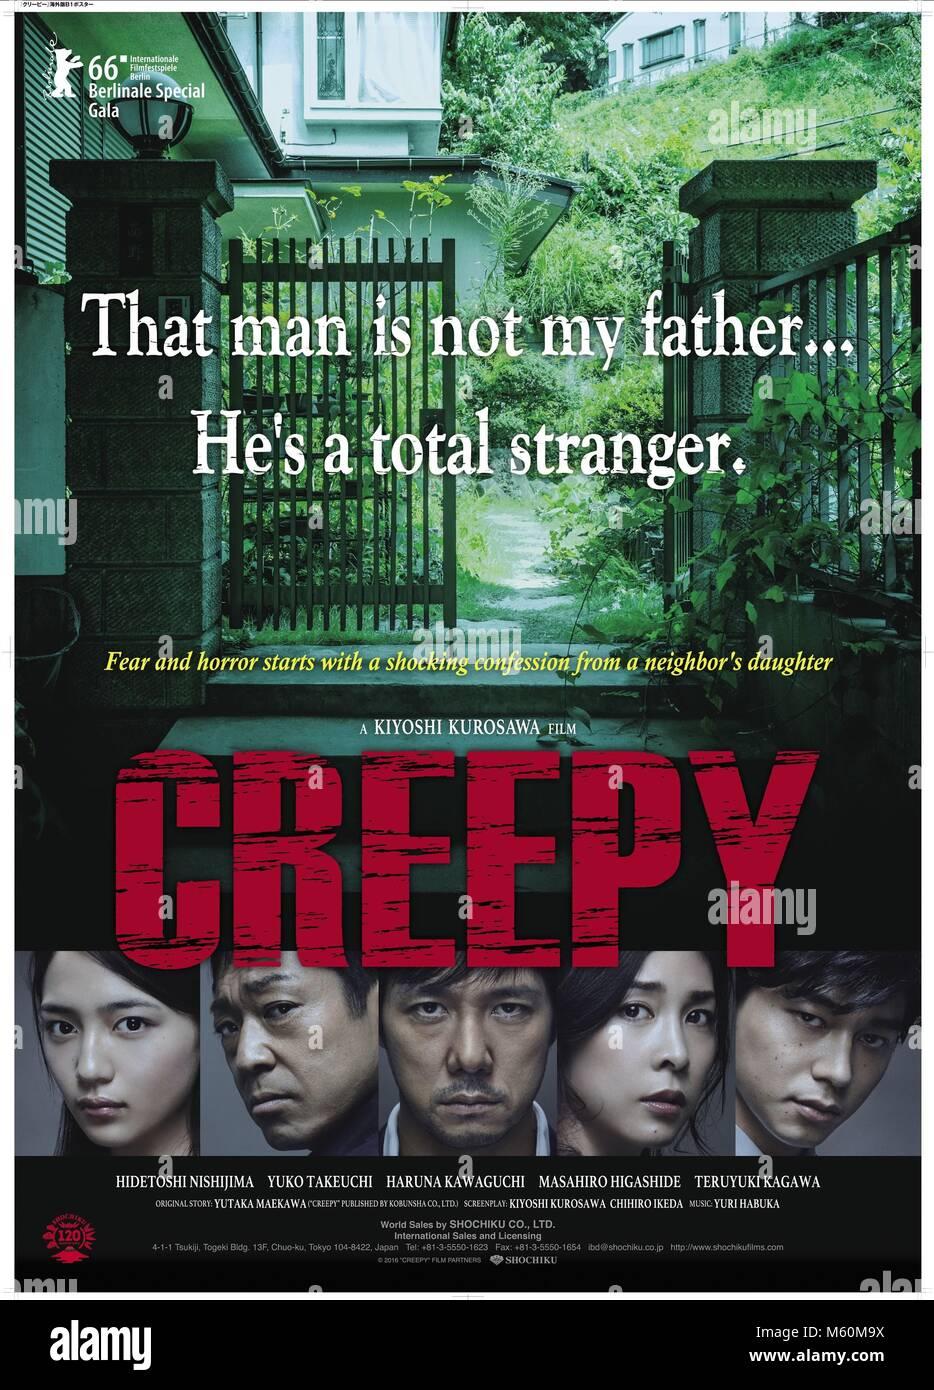 MOVIE POSTER CREEPY (2016) - Stock Image